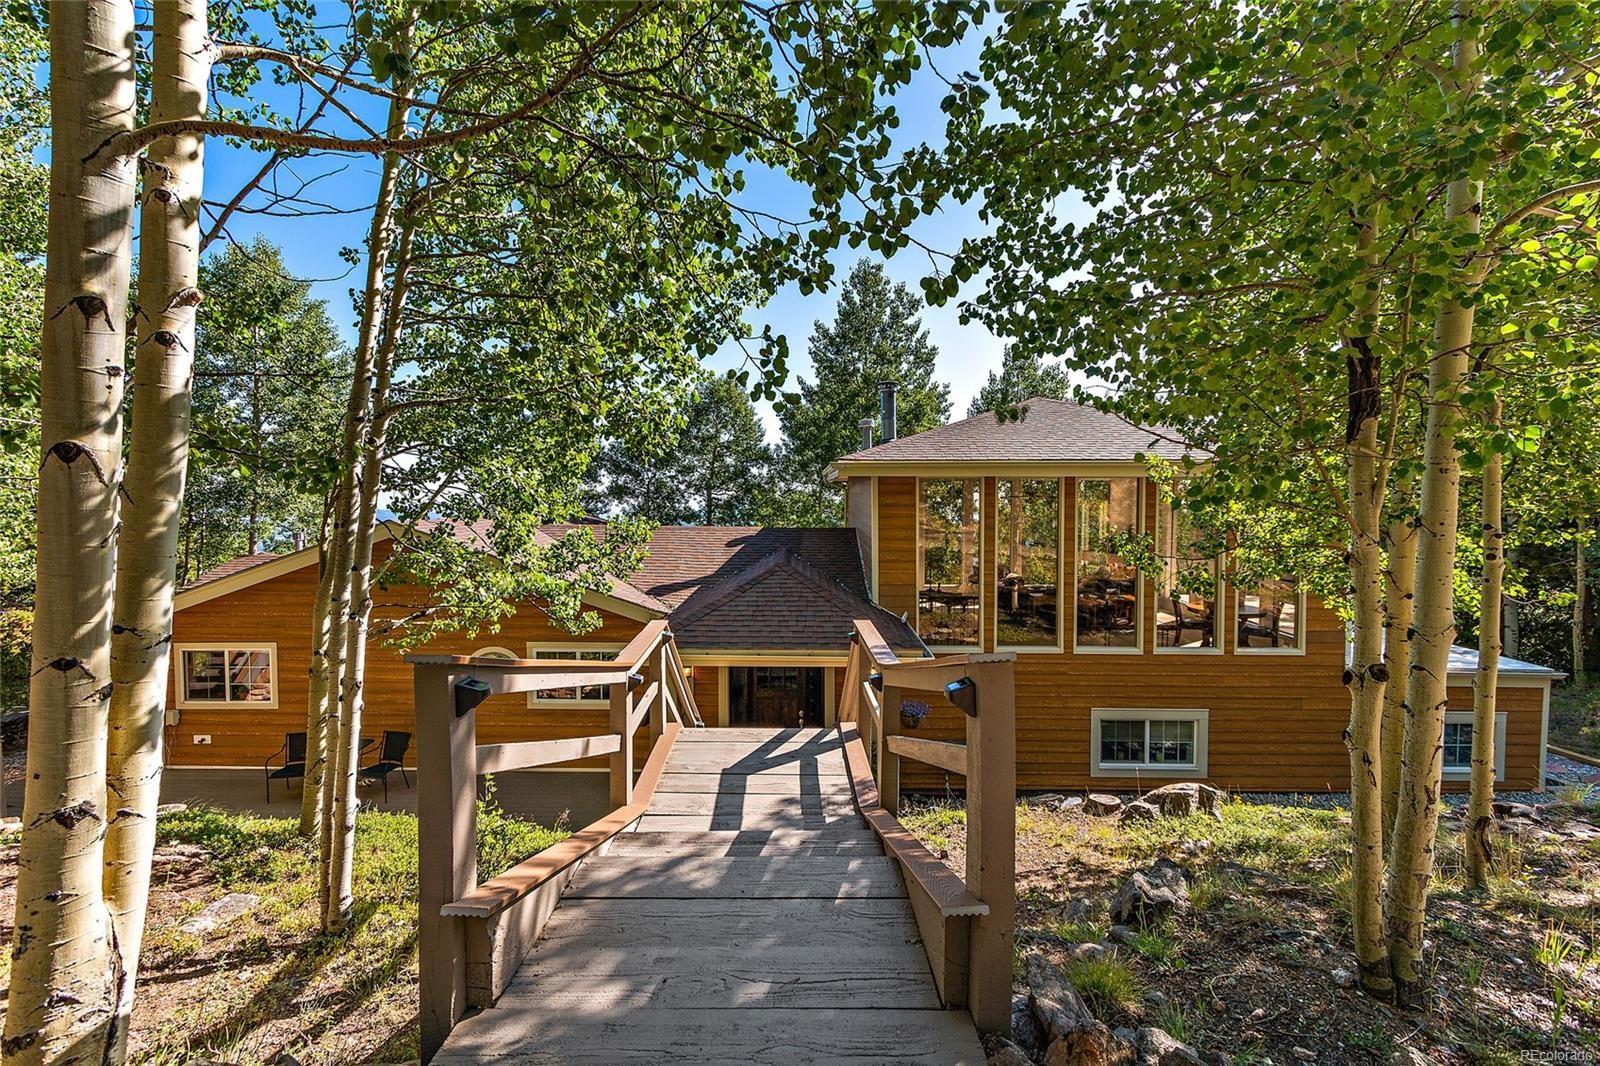 MLS# 4955649 - 1 - 10896 Timothys Drive, Conifer, CO 80433